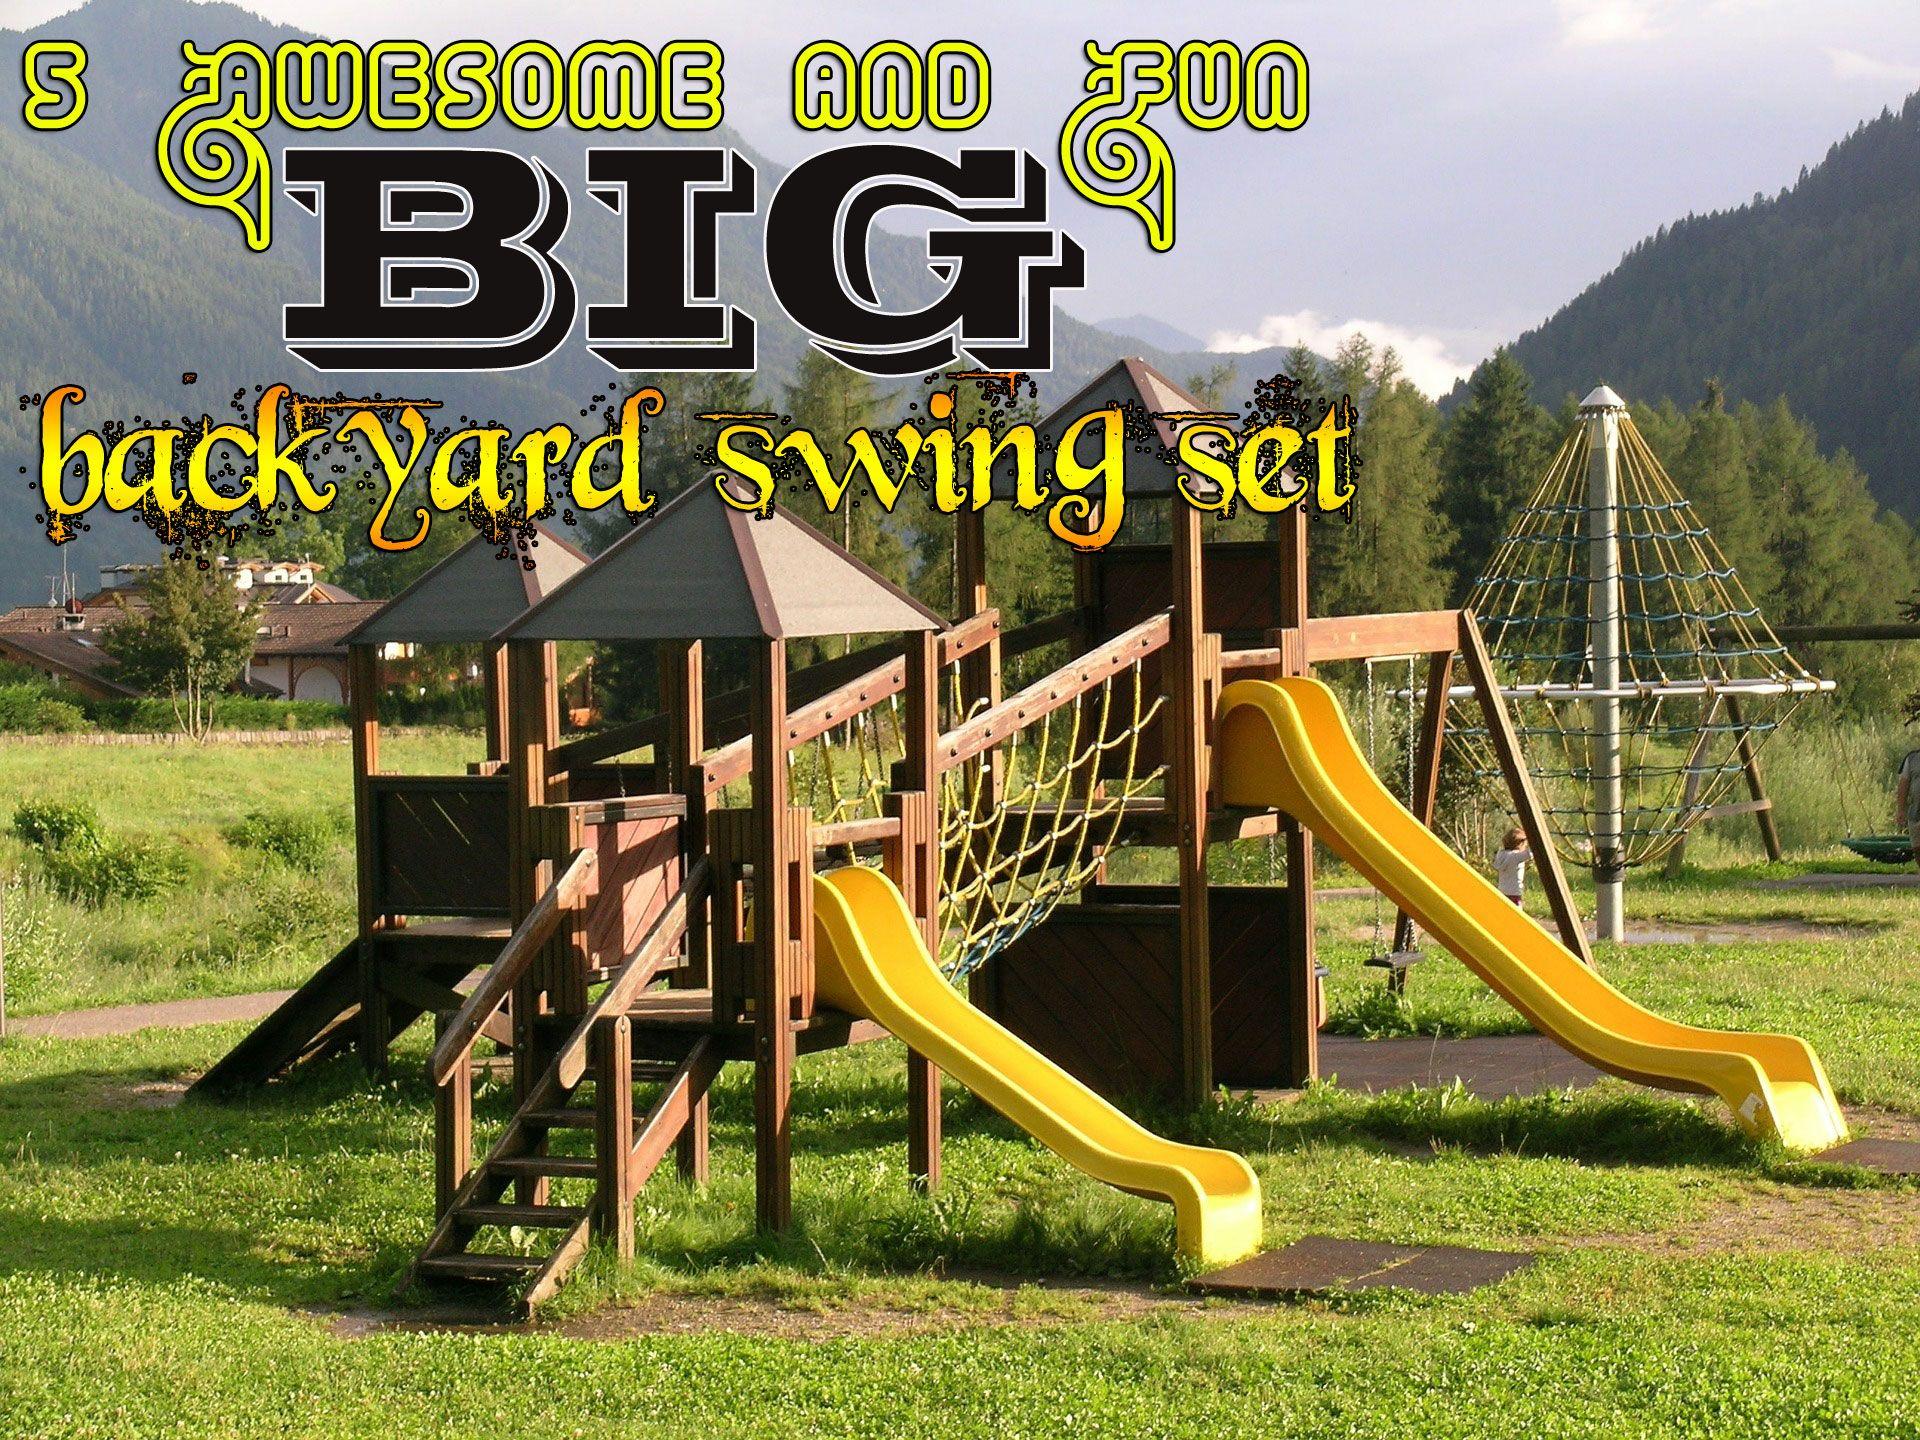 Big Backyard Swing Set - BACKYARD HOME